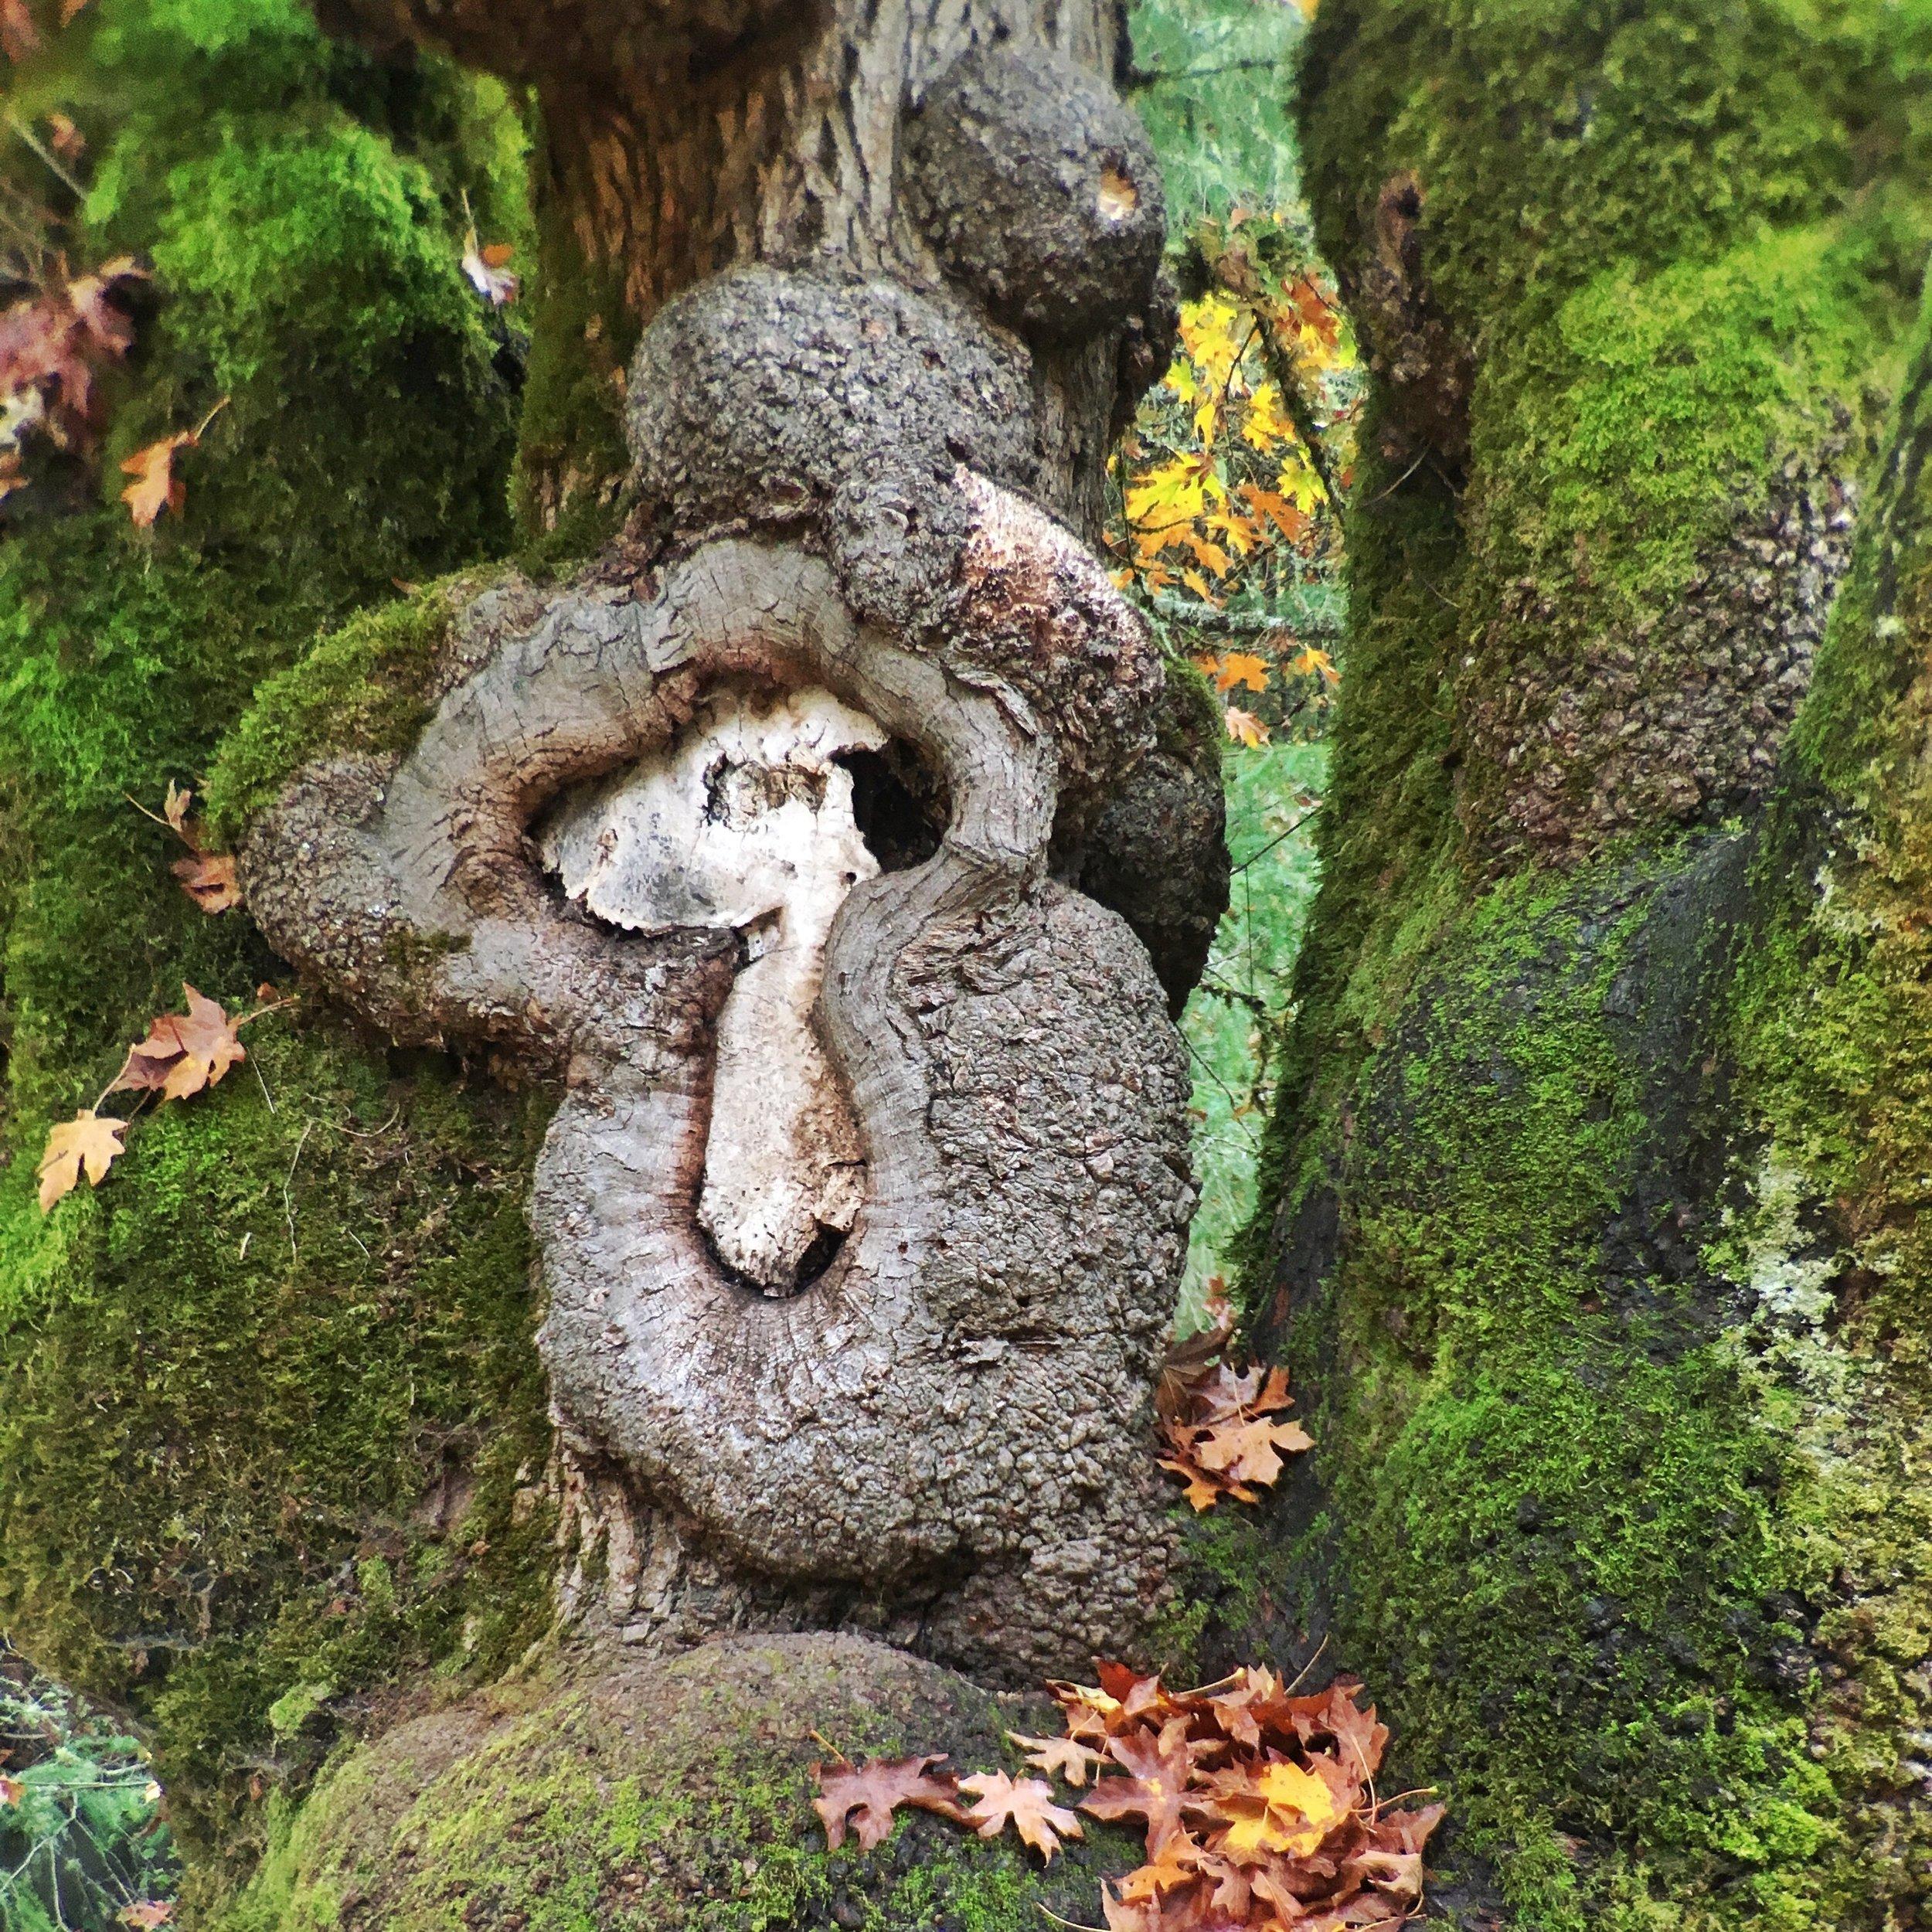 Snoopy in the Tree.jpg